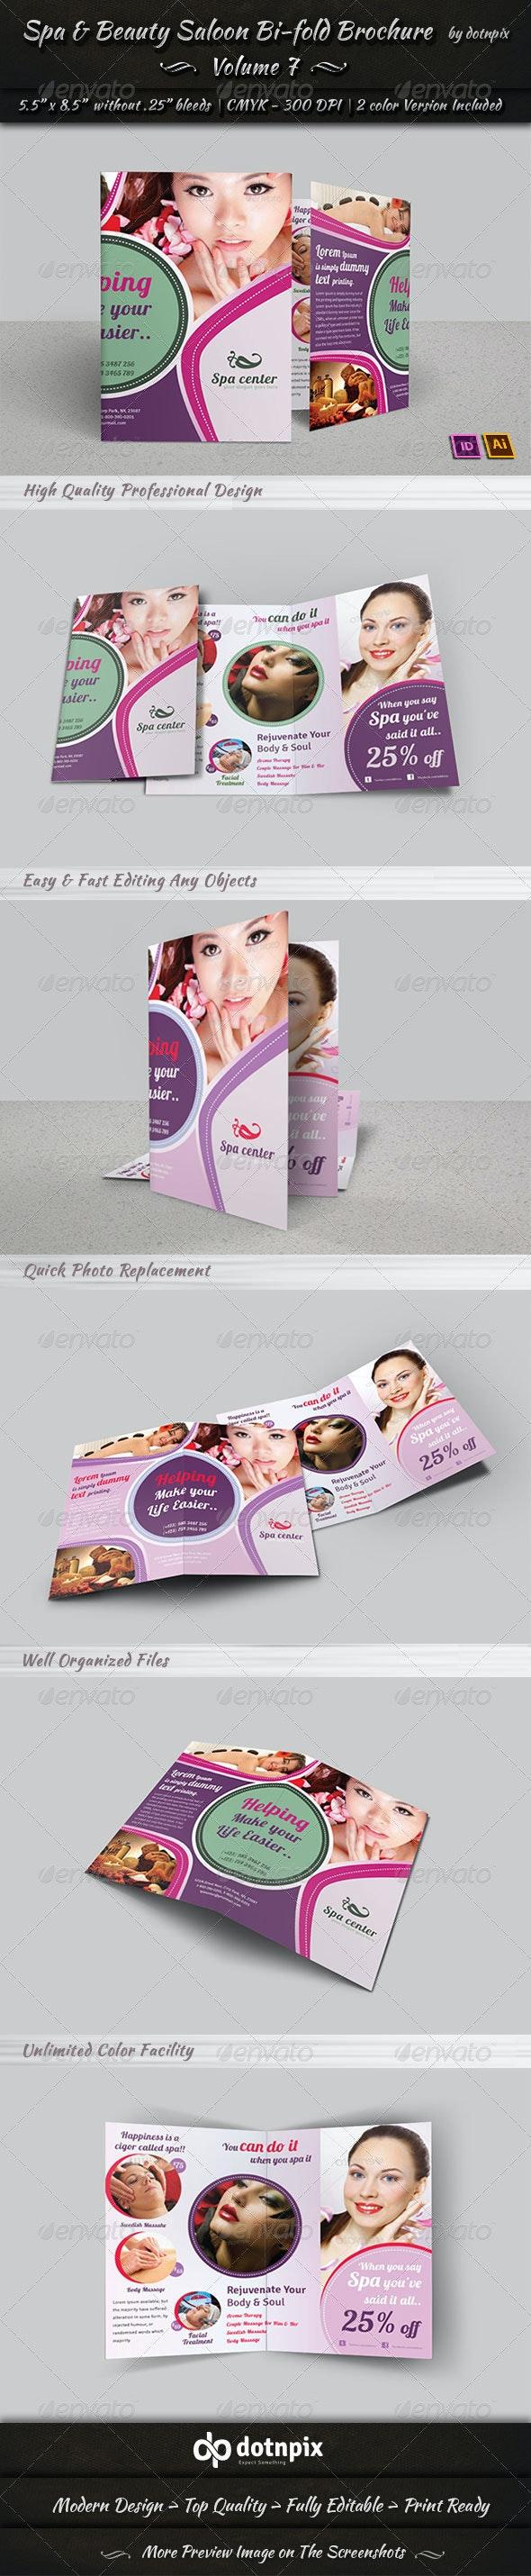 Spa & Beauty Saloon Bi-fold Brochure | Volume 7 - Corporate Brochures